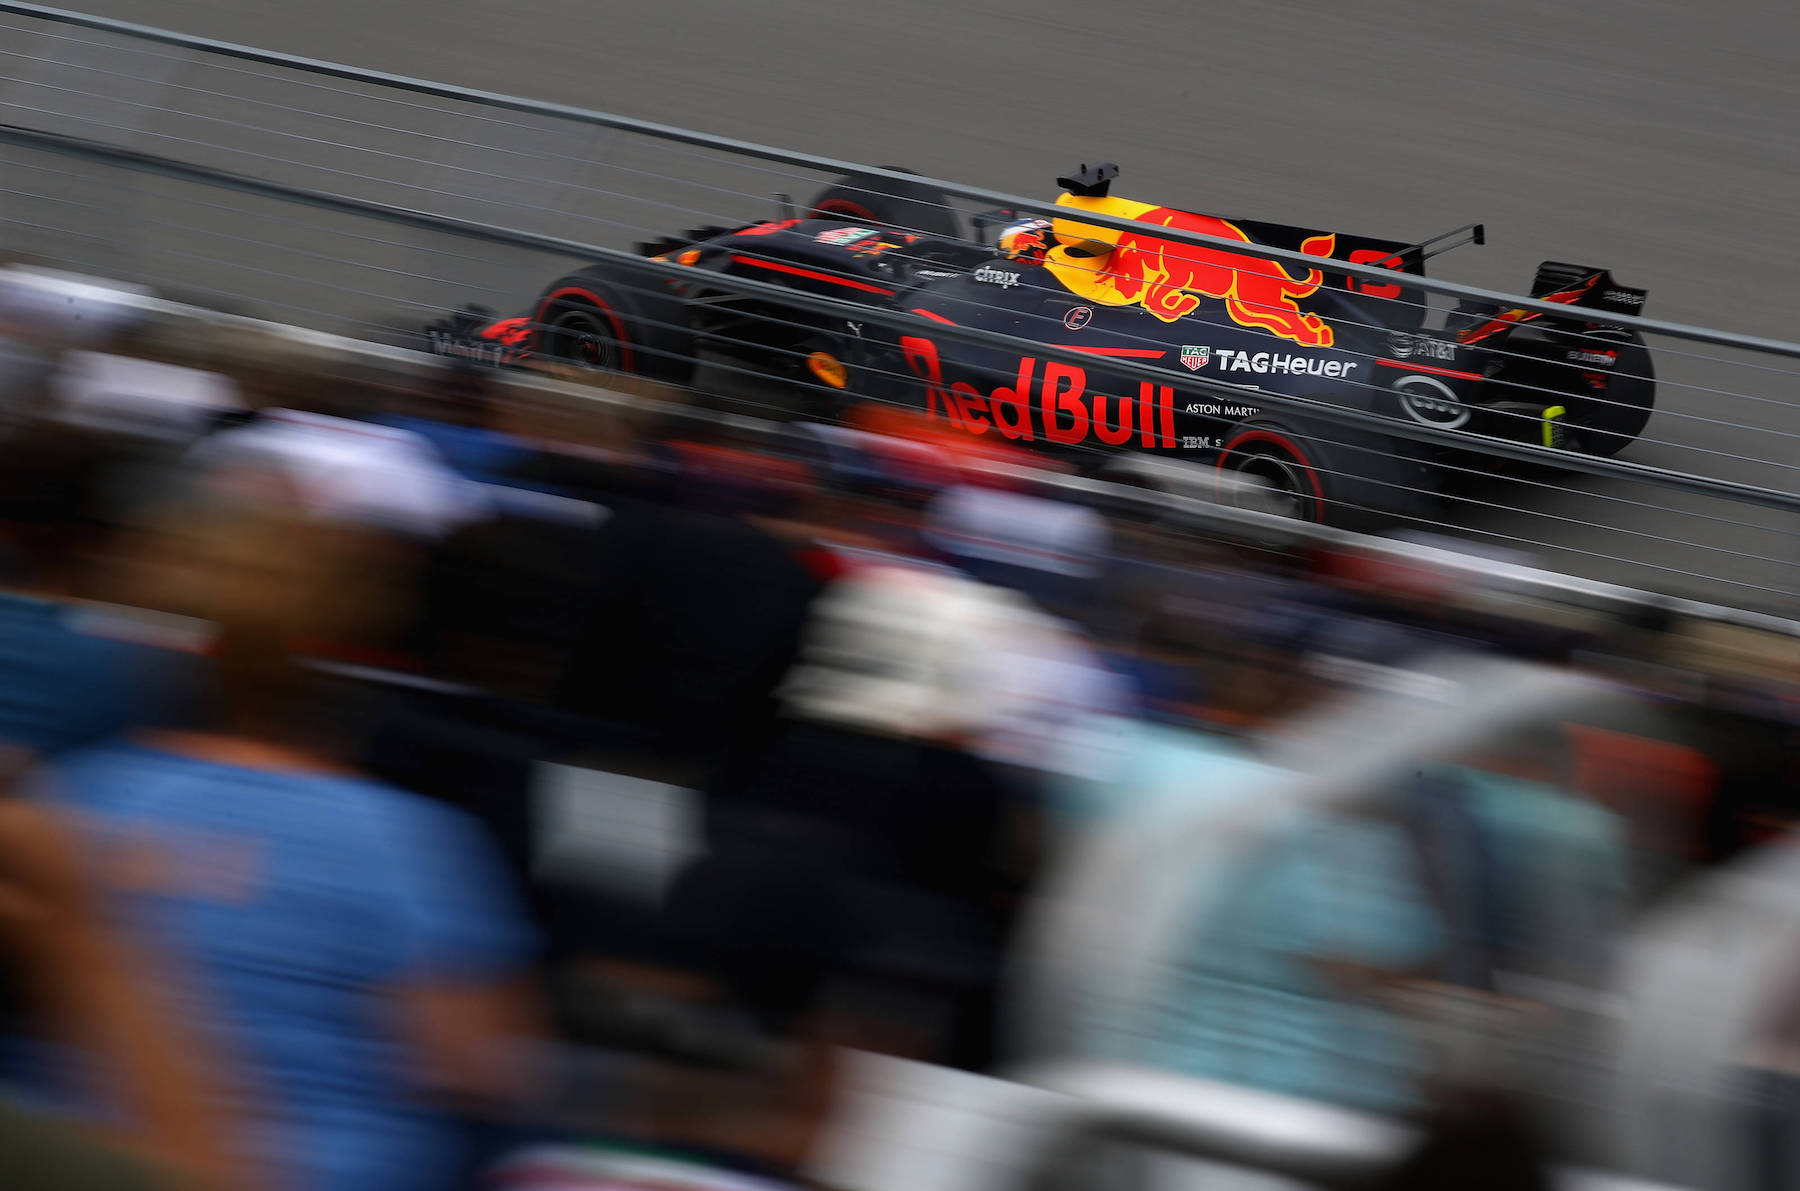 2017 Daniel Ricciardo | Red Bull RB13 | 2017 Canadian GP FP1 1 copy.jpg